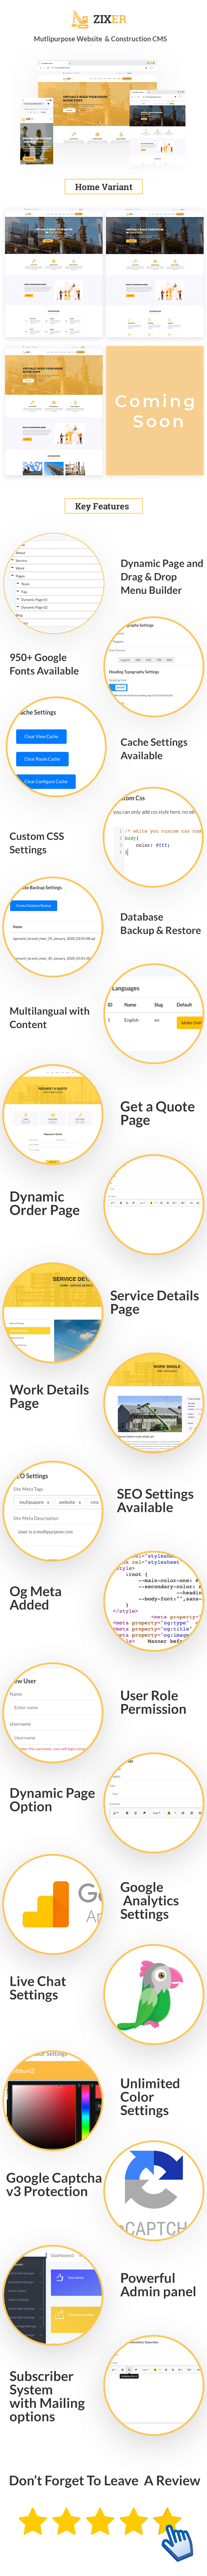 Zixer - Multipurpose Website & Construction Business Company CMS - 1